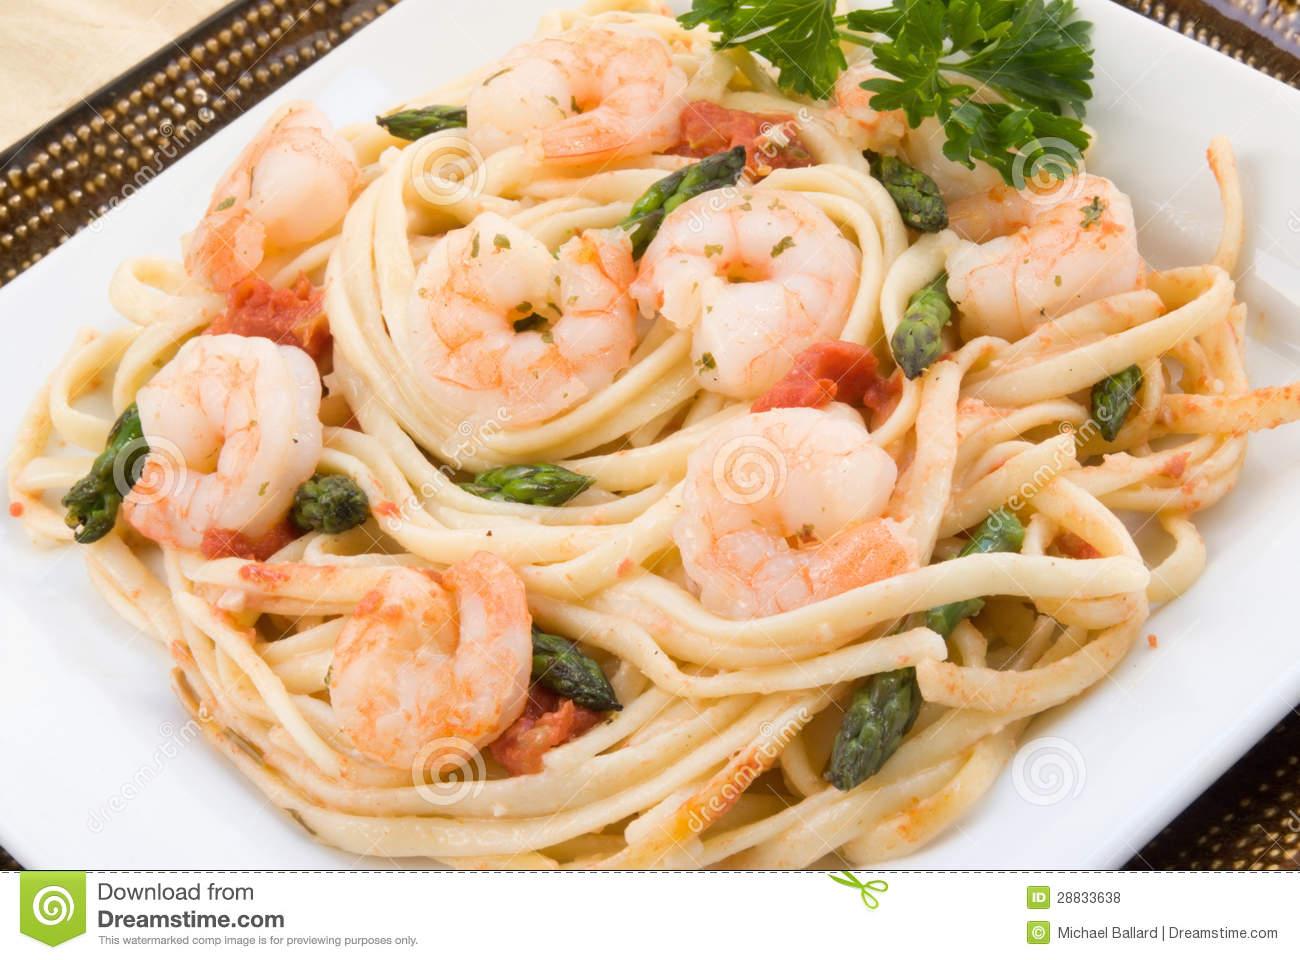 Shrimp Scampi With Asparagus Royalty Free Stock Photos.